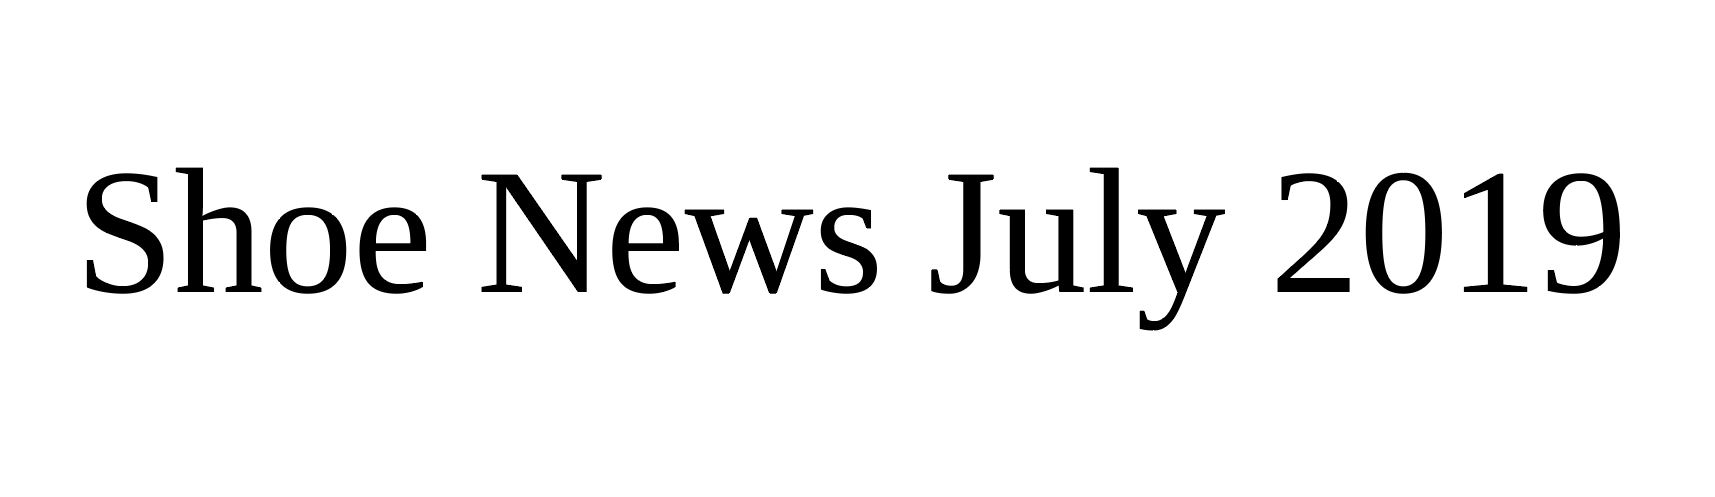 shoe news 2019